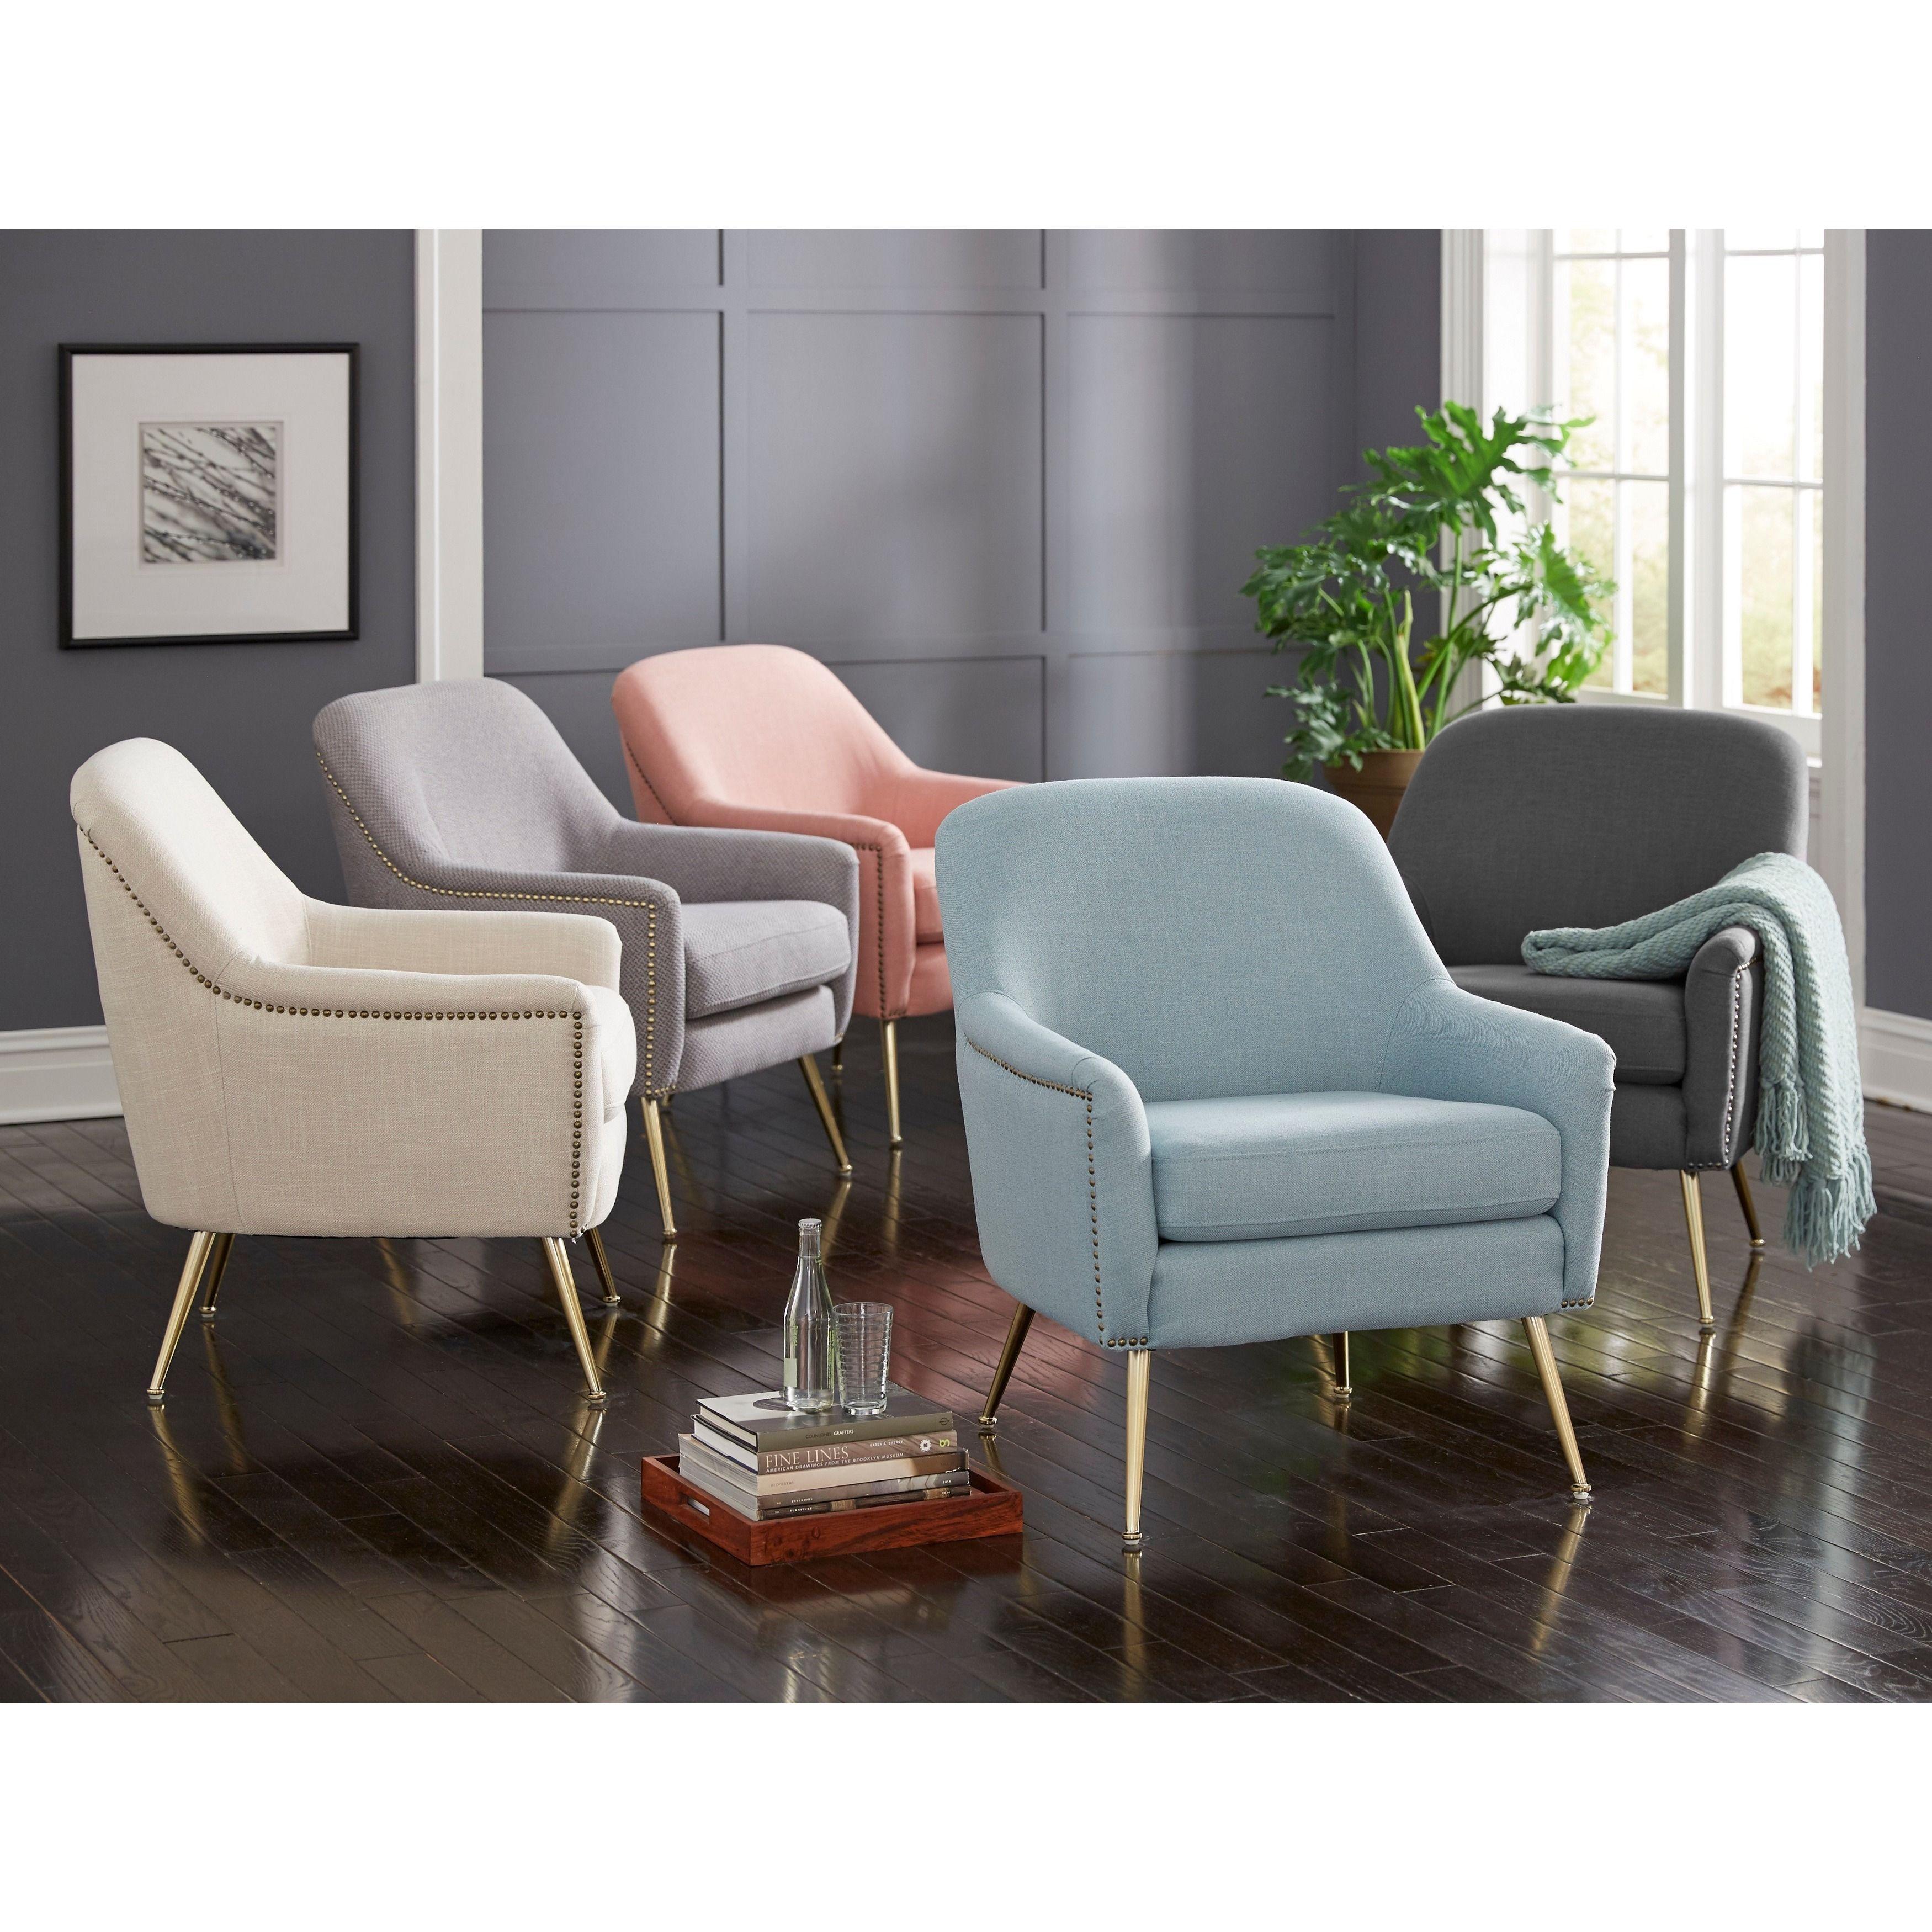 Pleasing Lifestorey Vita Accent Chair Blue Fabric In 2019 Machost Co Dining Chair Design Ideas Machostcouk